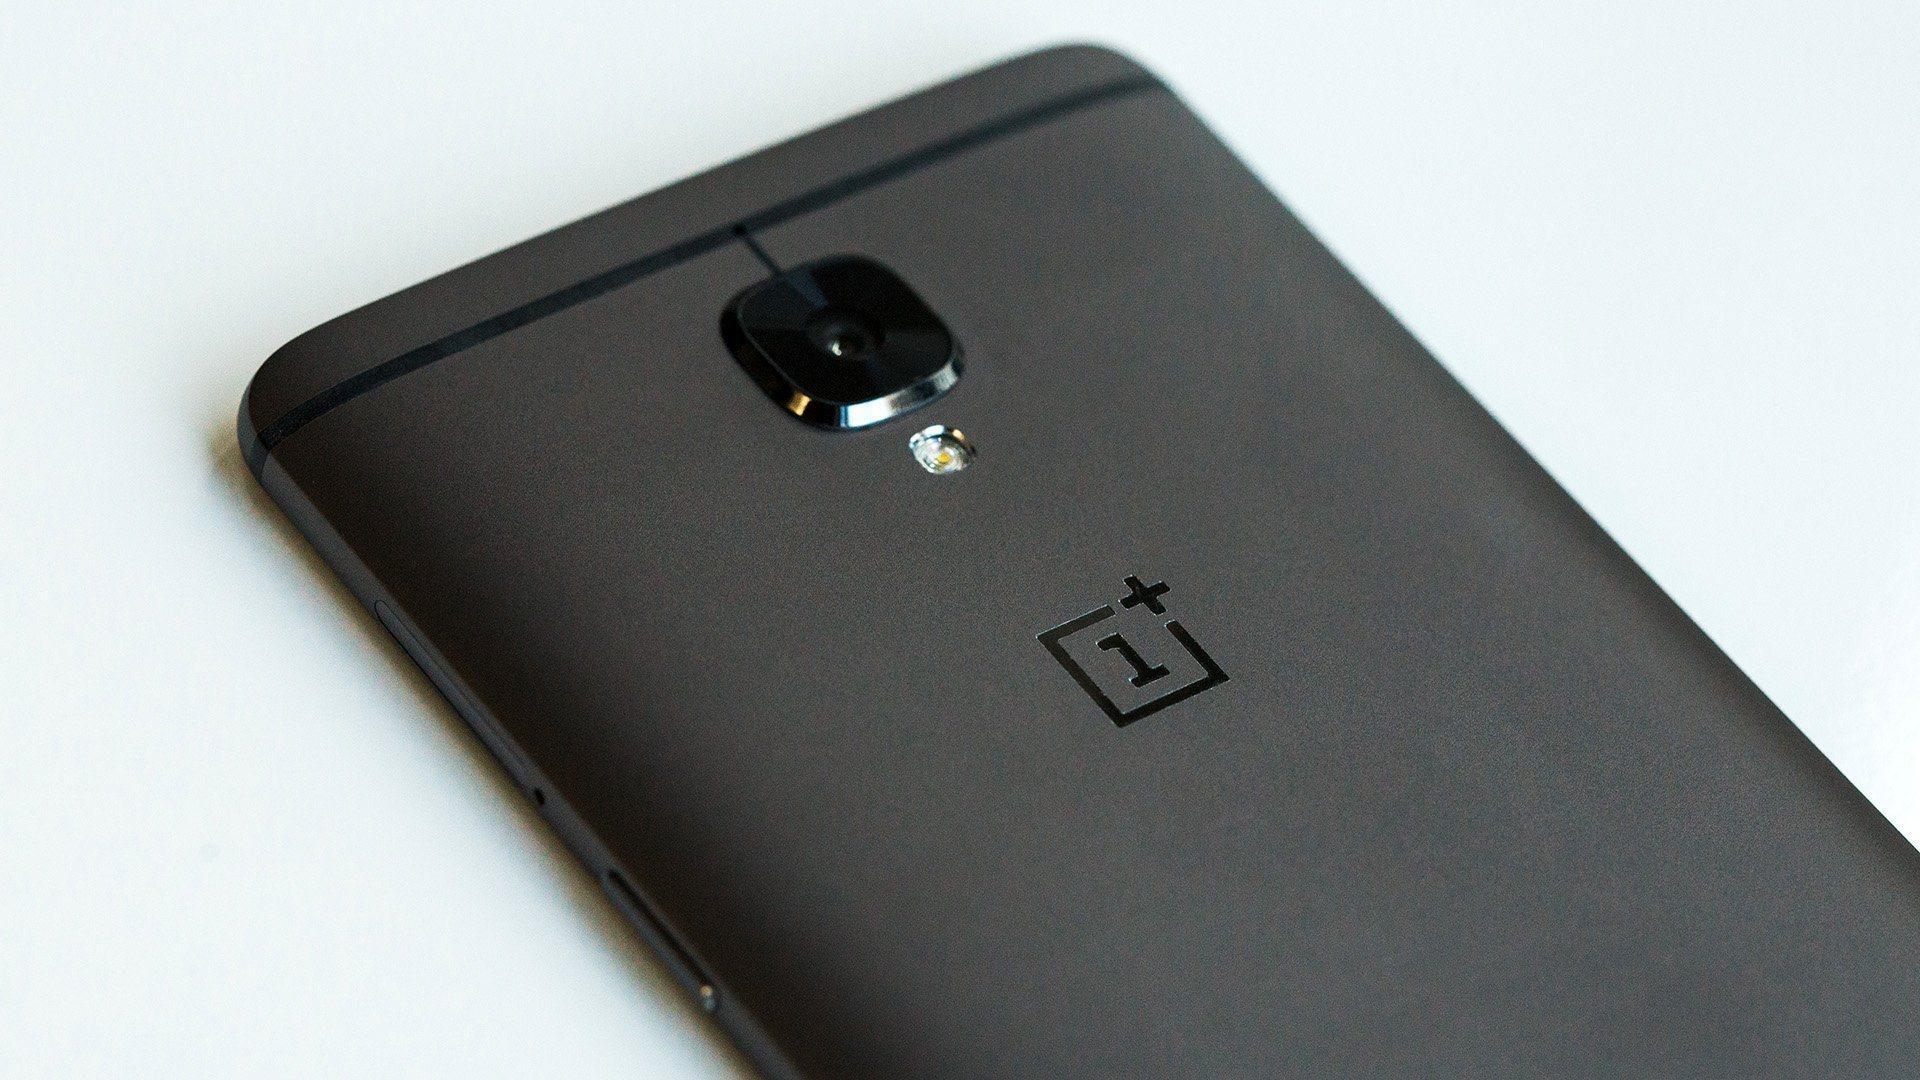 OnePlus 3T